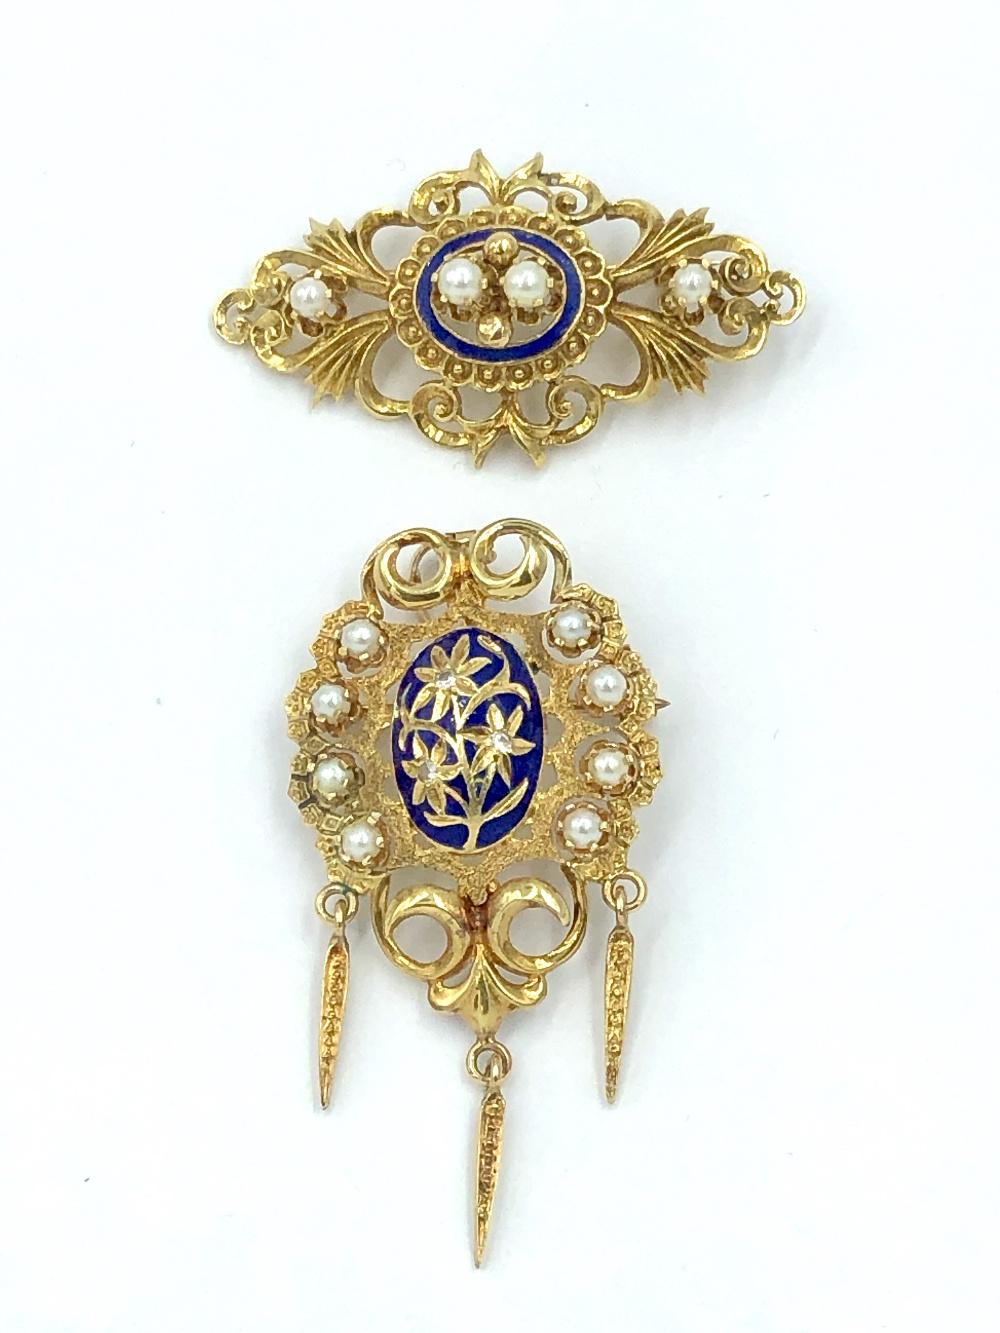 Lot 56 - 15ct Gold enamel & seed pearl pendant & brooch